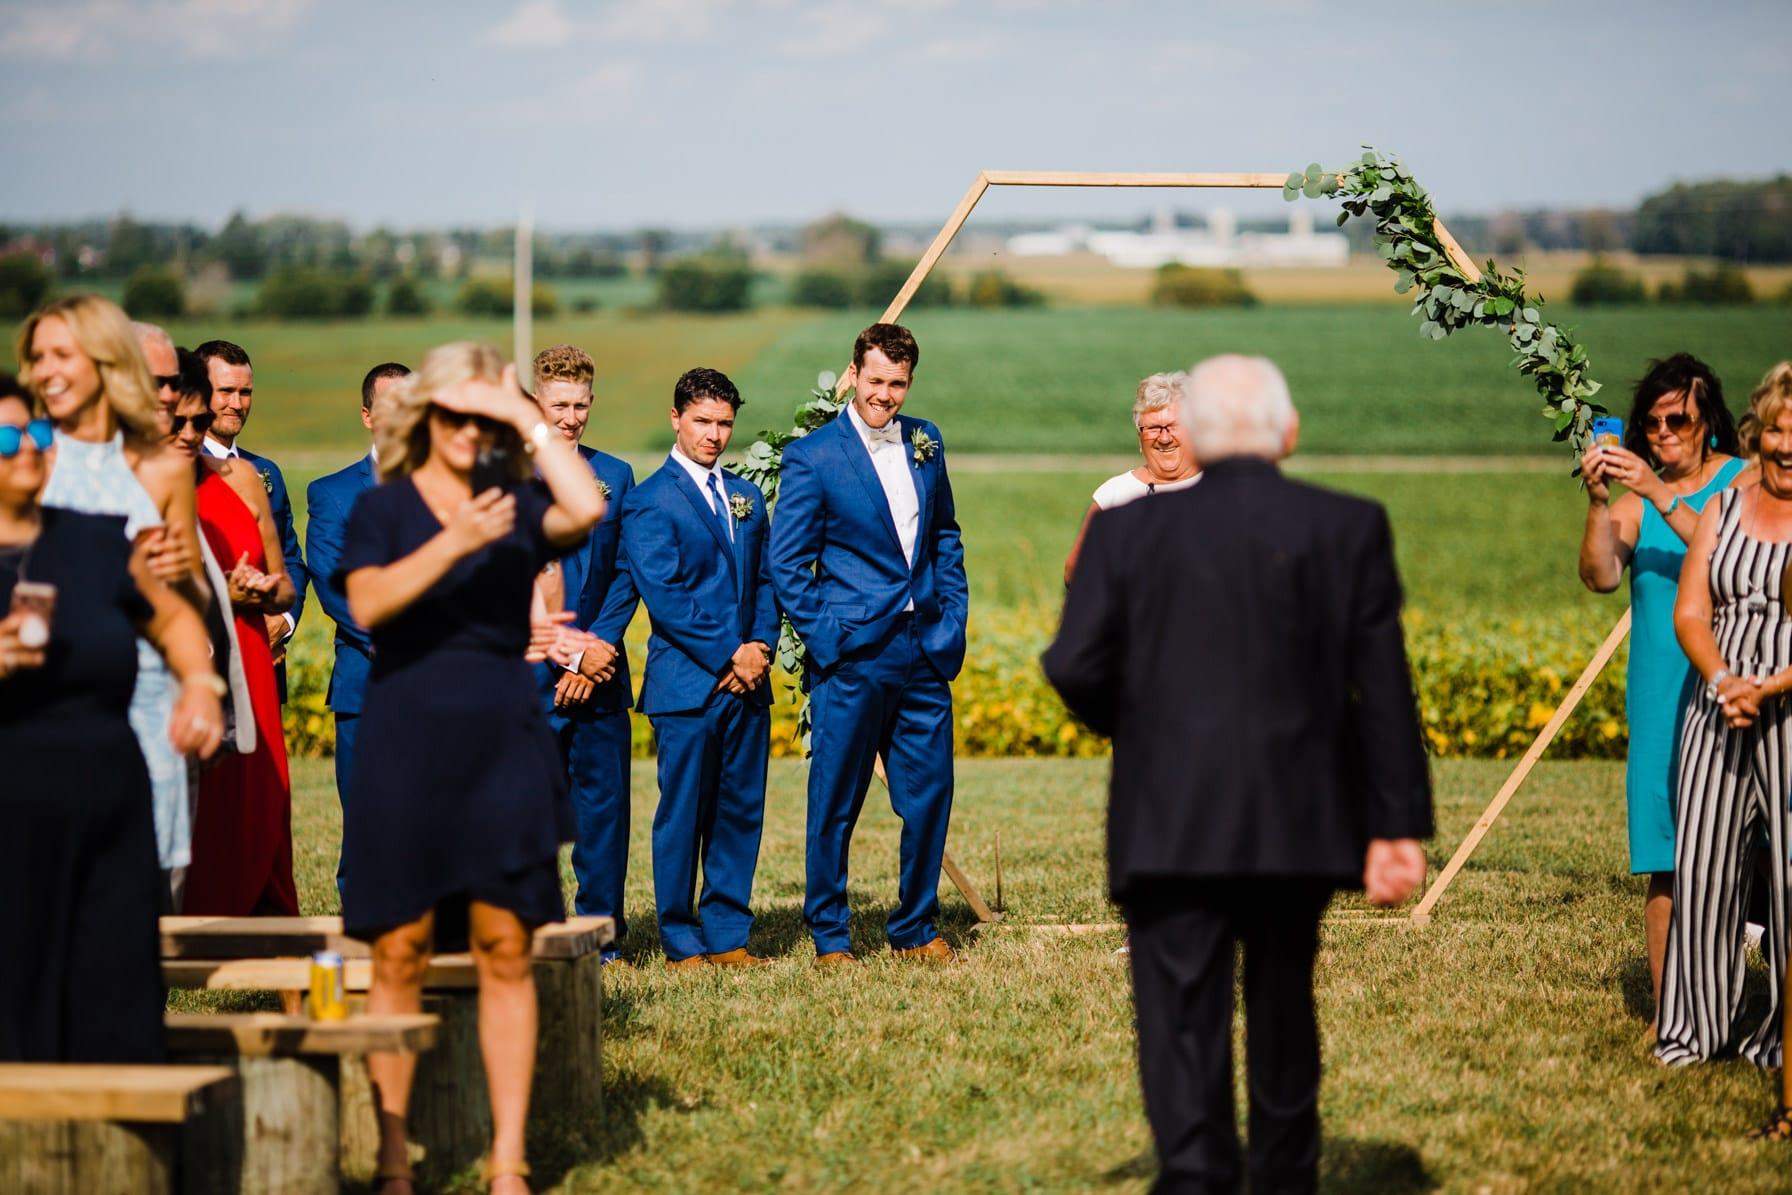 grandfather as ring bearer - summer farm wedding